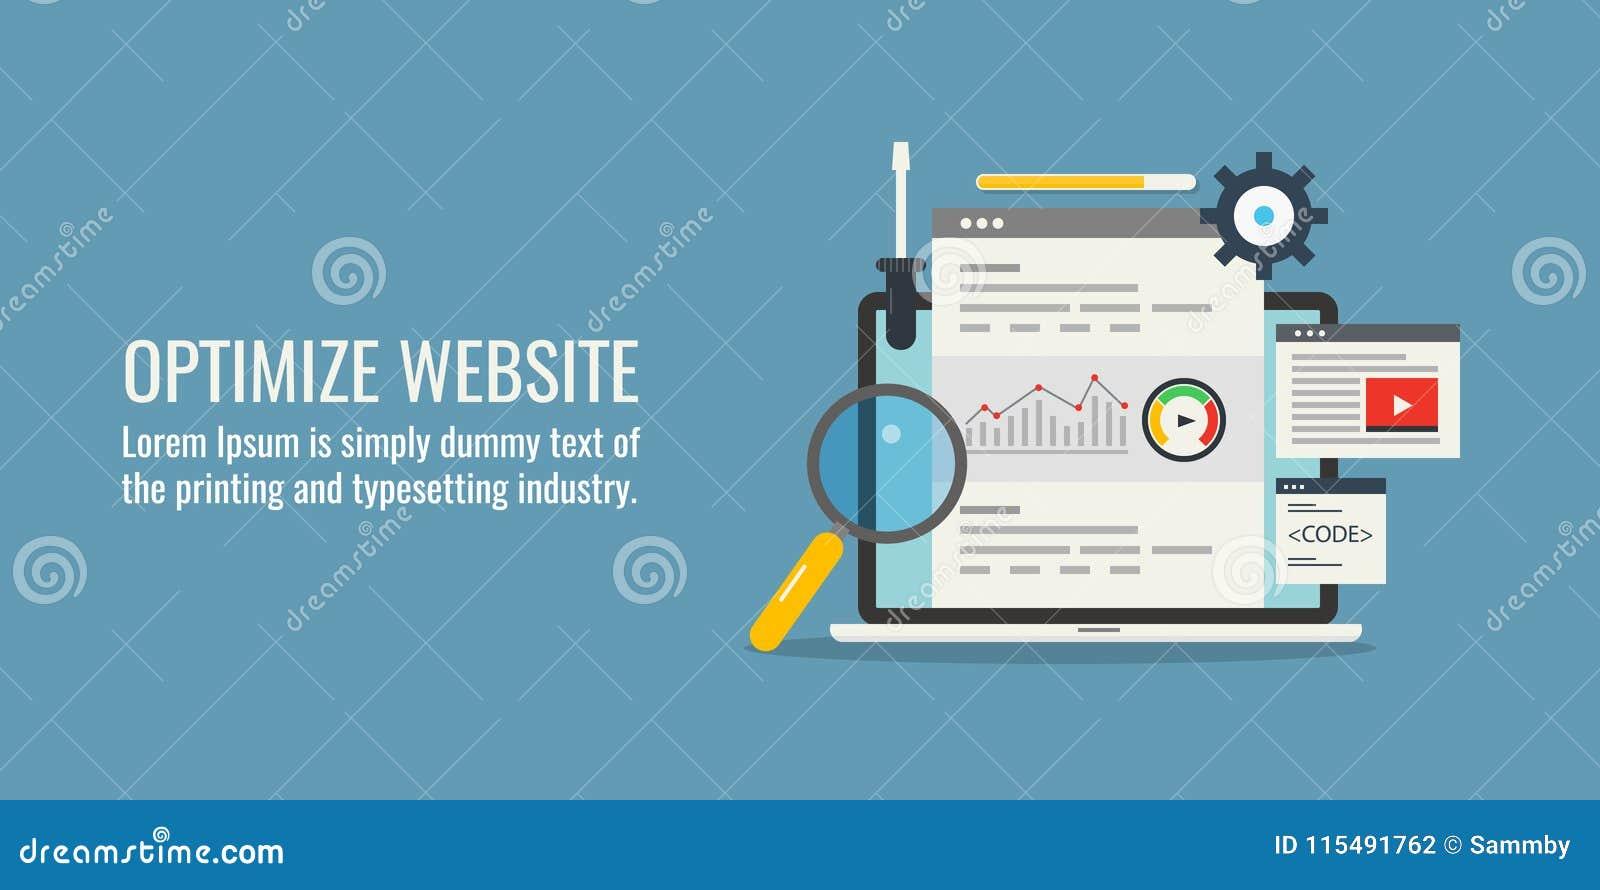 Optimize Website - Website Seo - Responsive Design - High